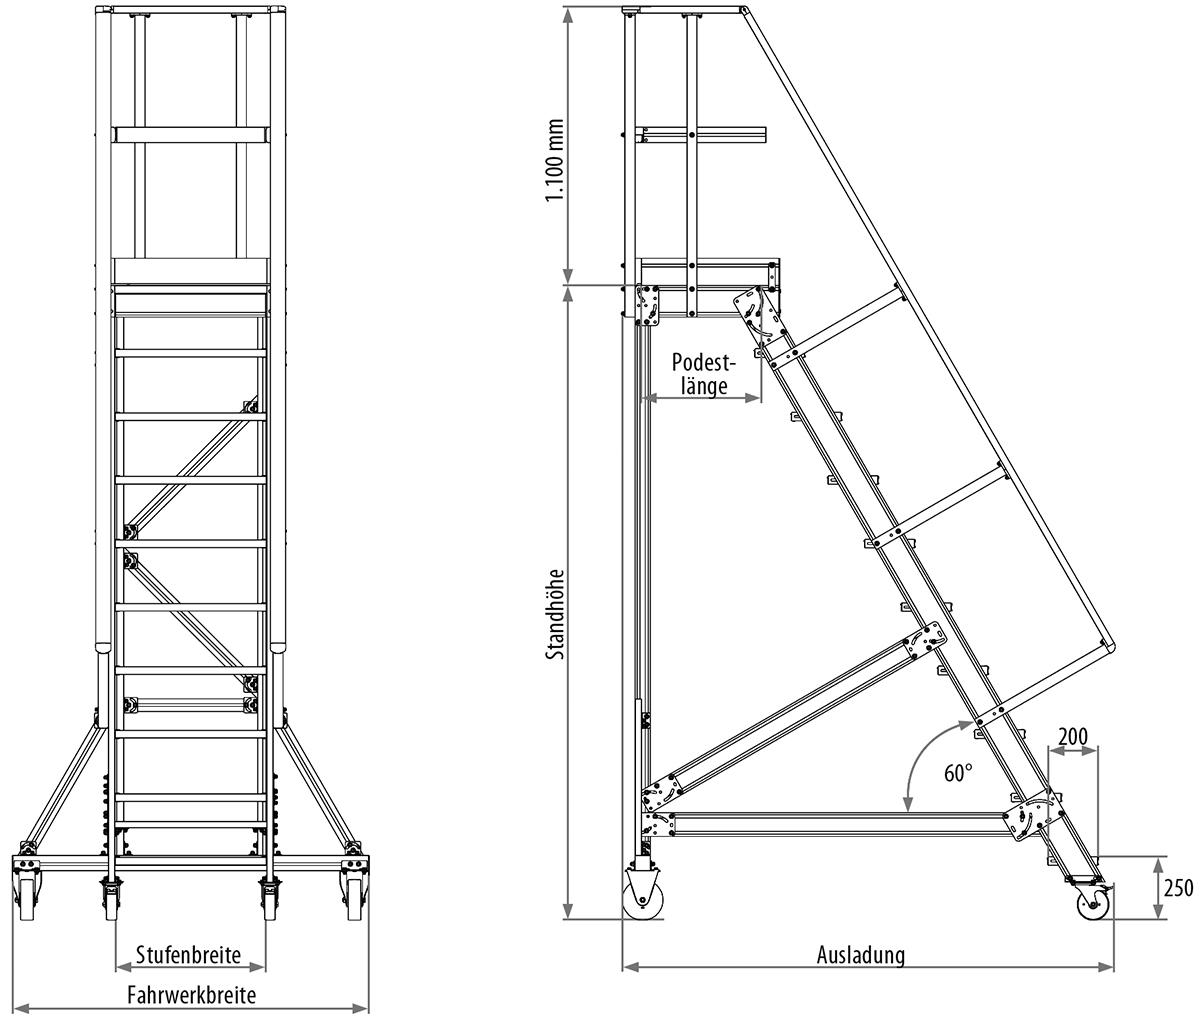 Hymer Podesttreppe fahrbar 60° 5 Stufen - 600 mm